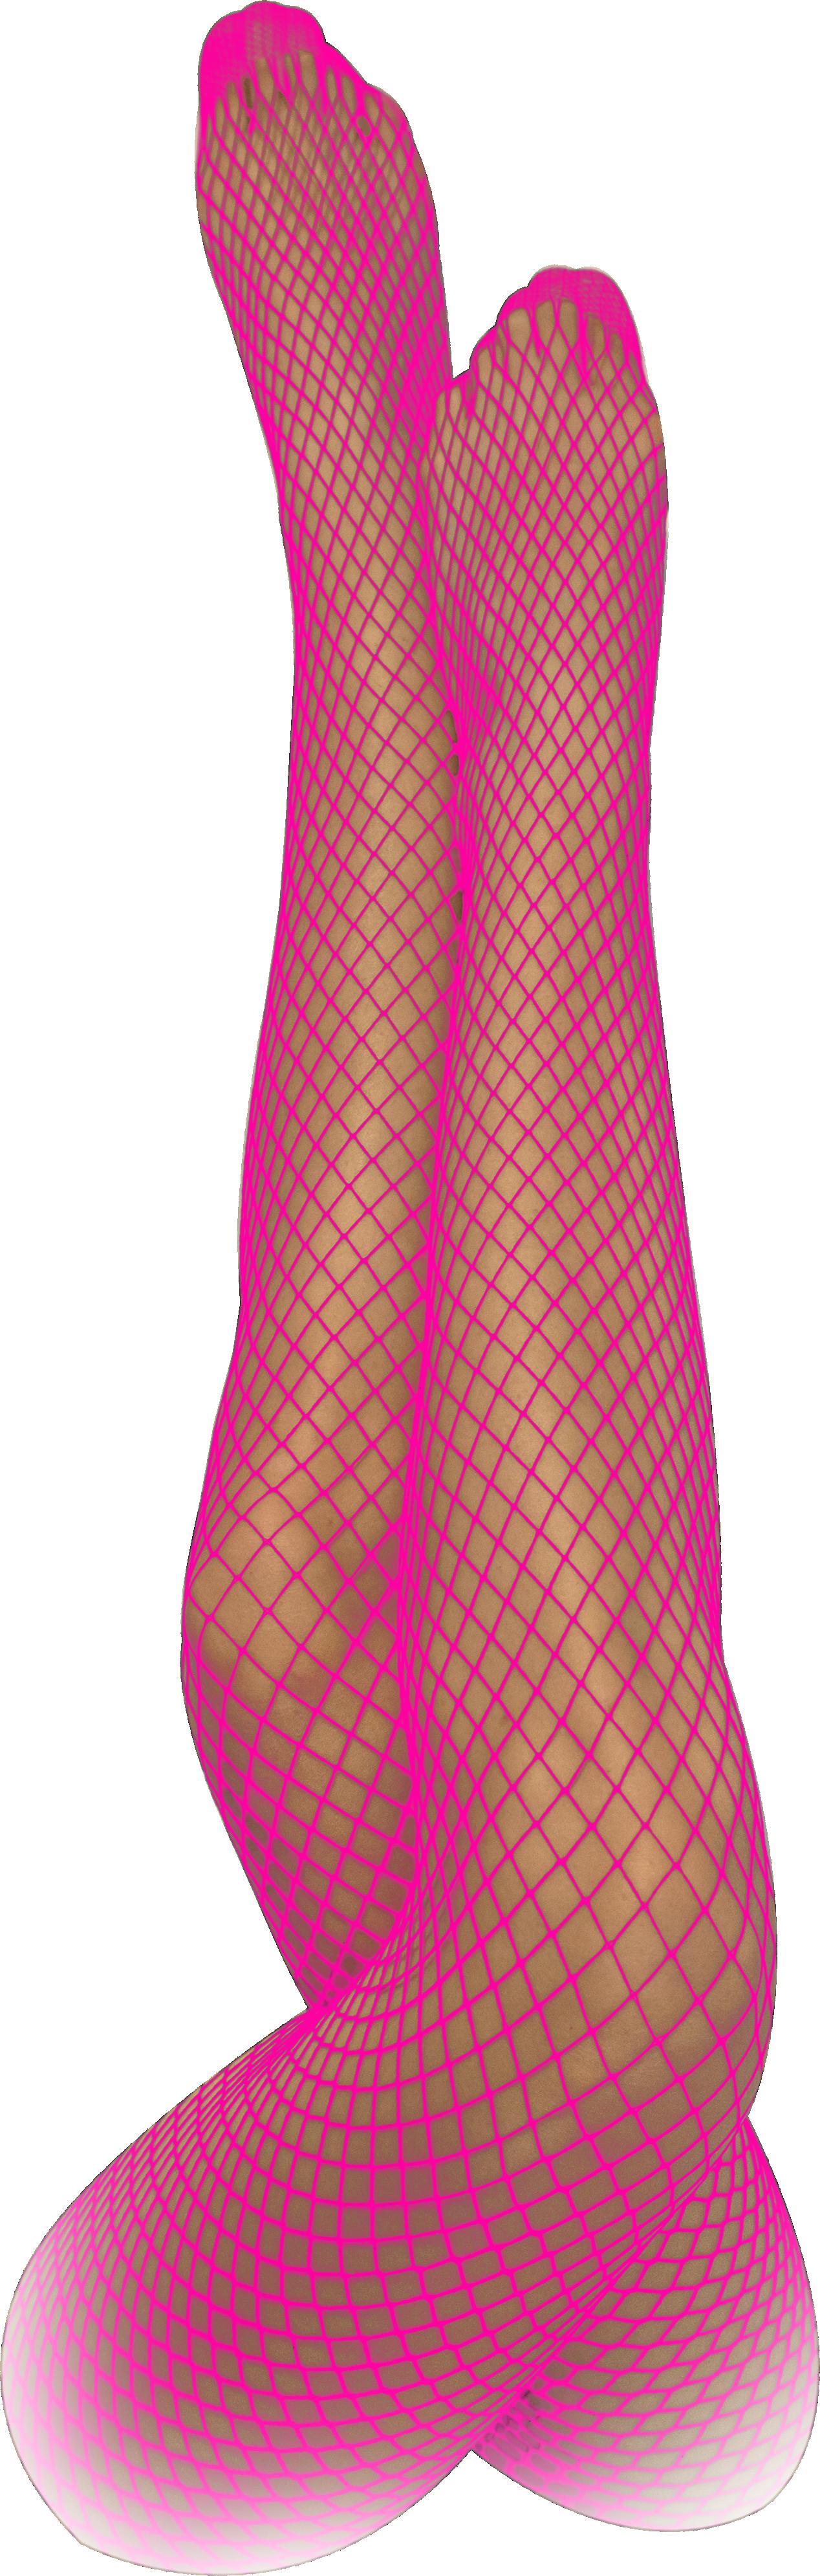 Netzstrumpfhose pink